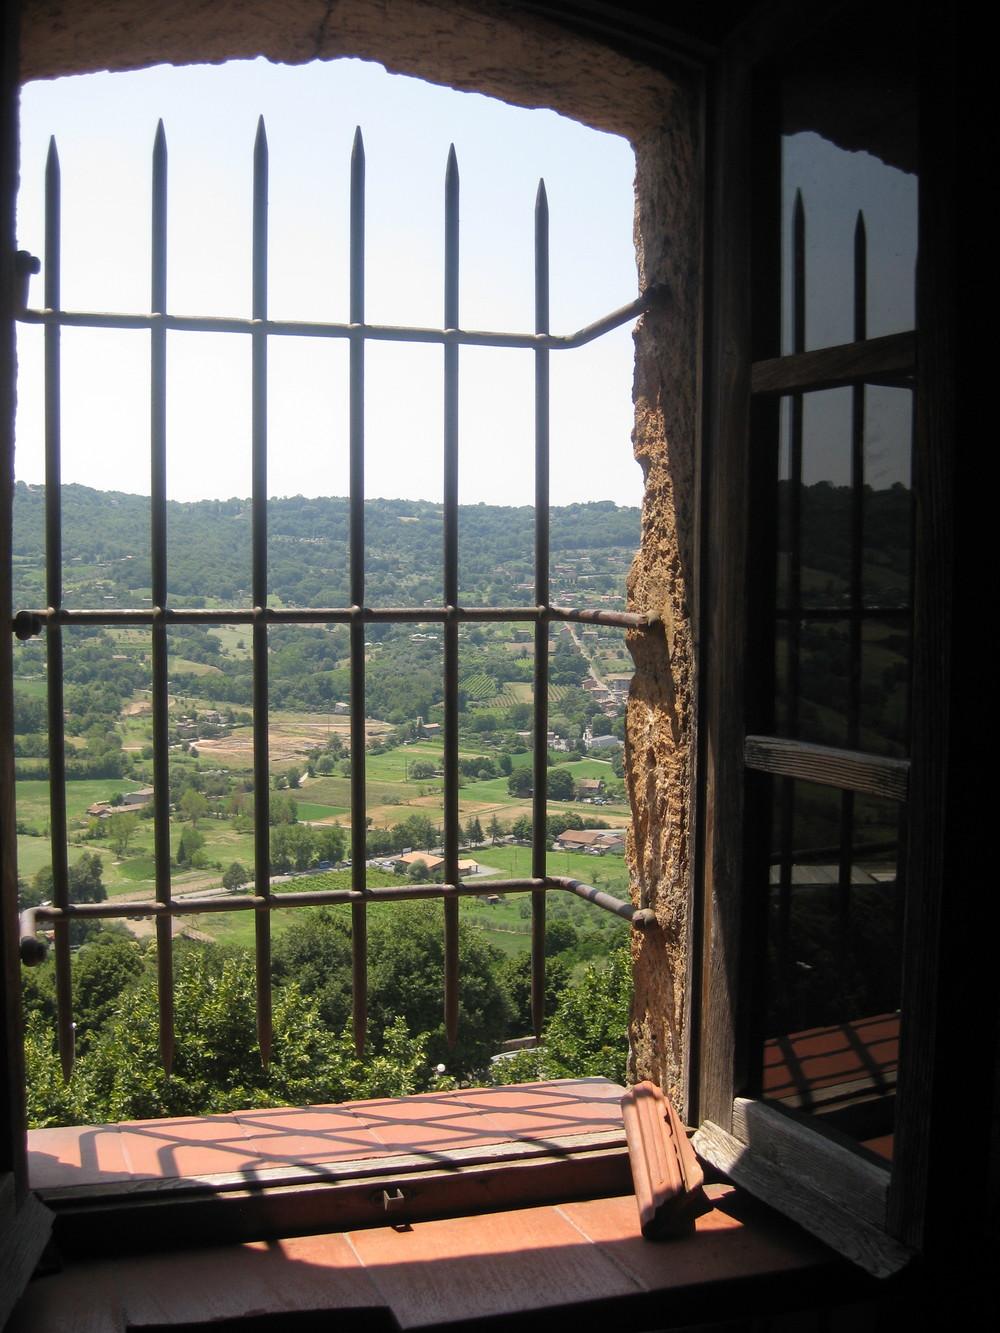 CRO Italy web 2013 - 008.JPG